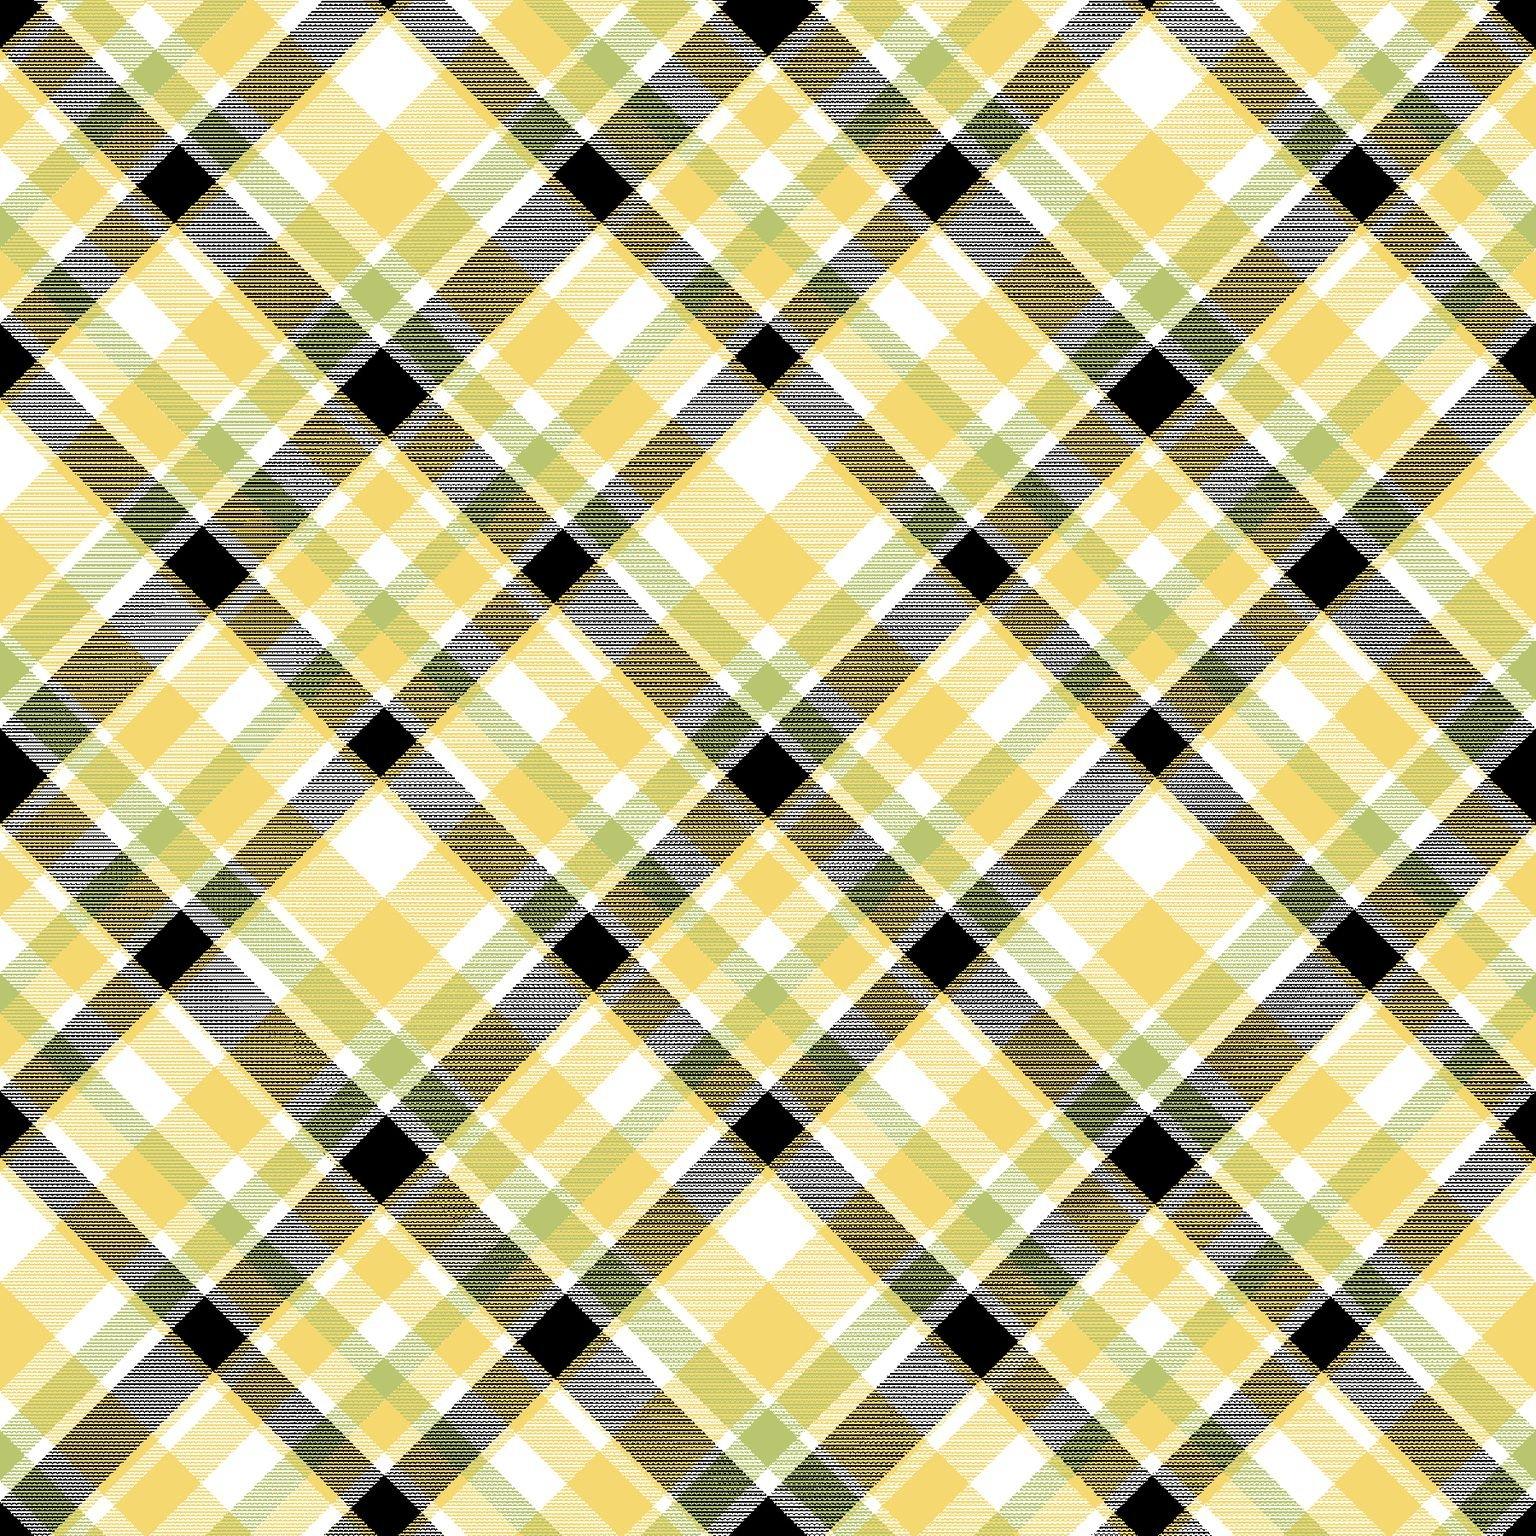 HG-Bee You! 101-49 Yellow/Black - Bias Plaid